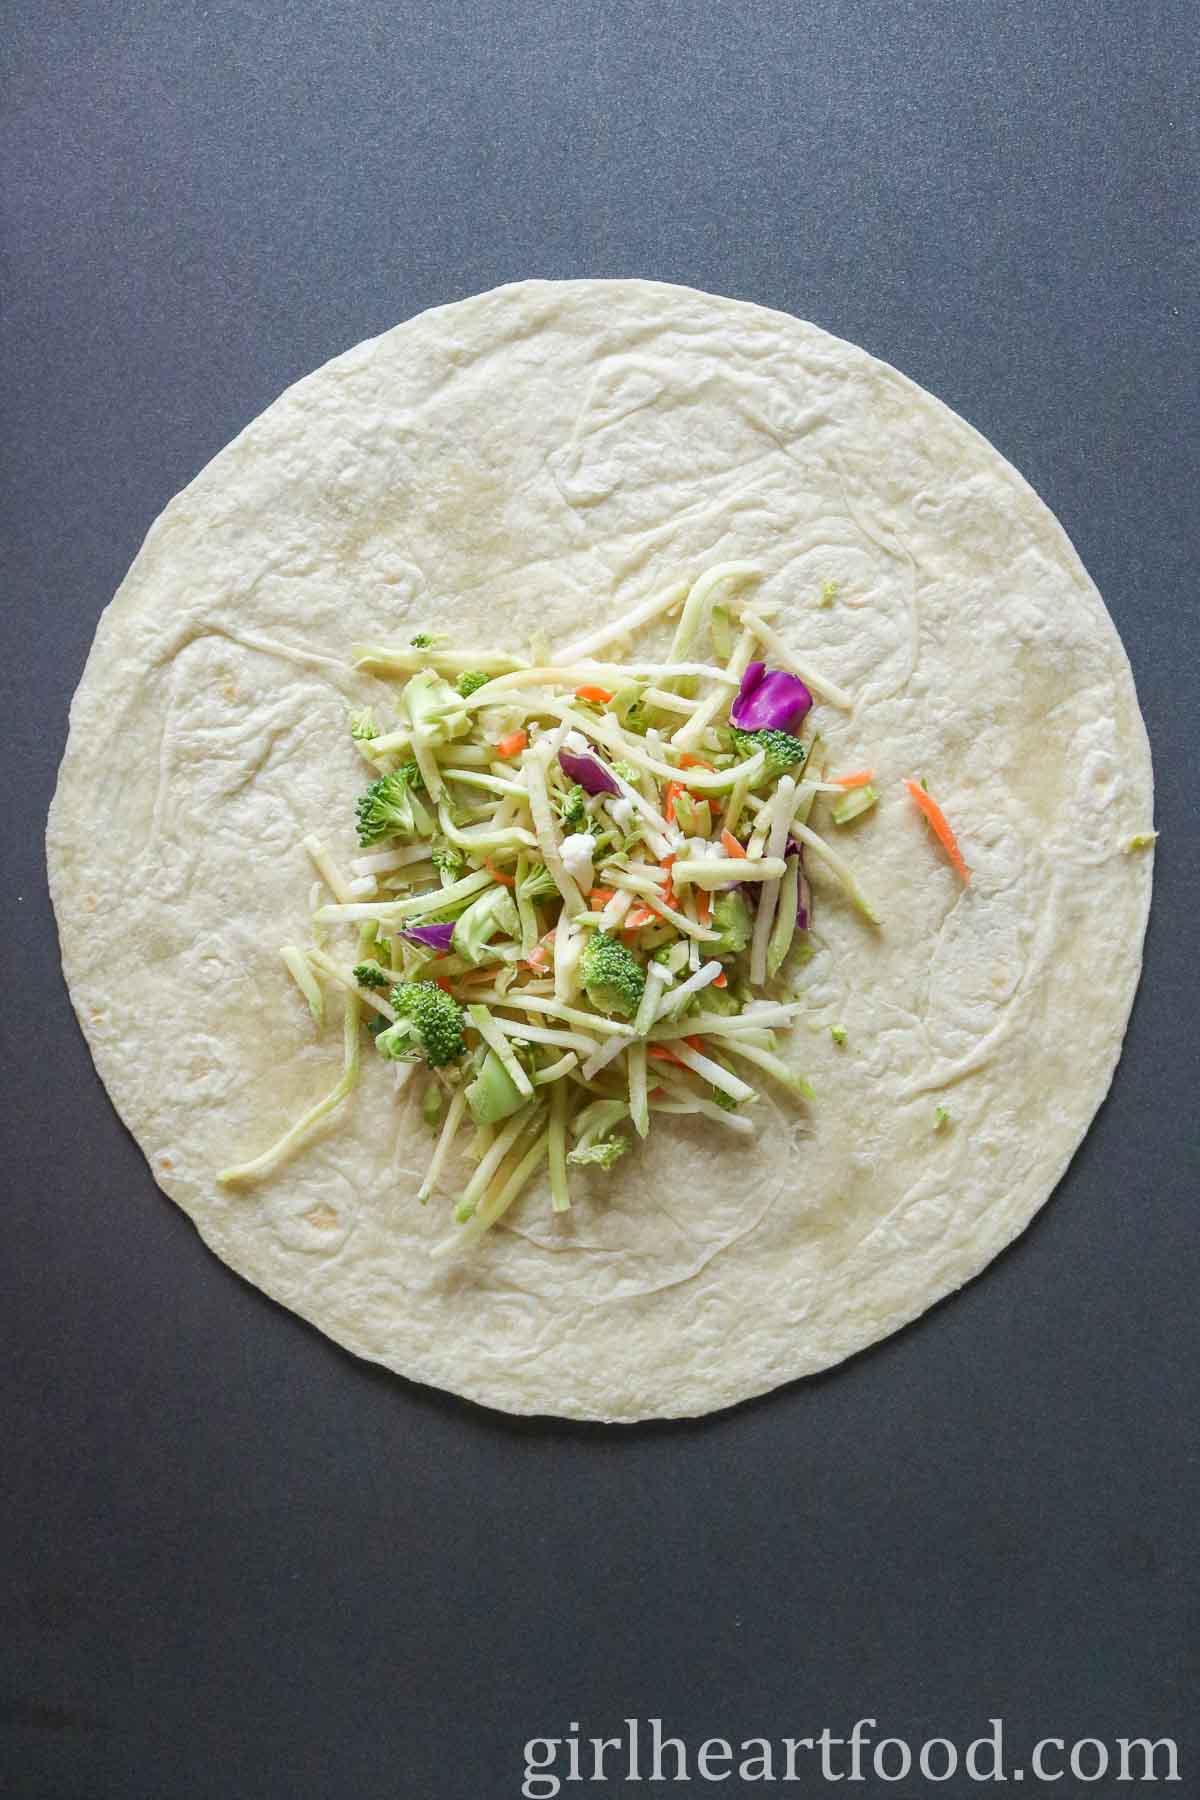 Salad mix on a tortilla.